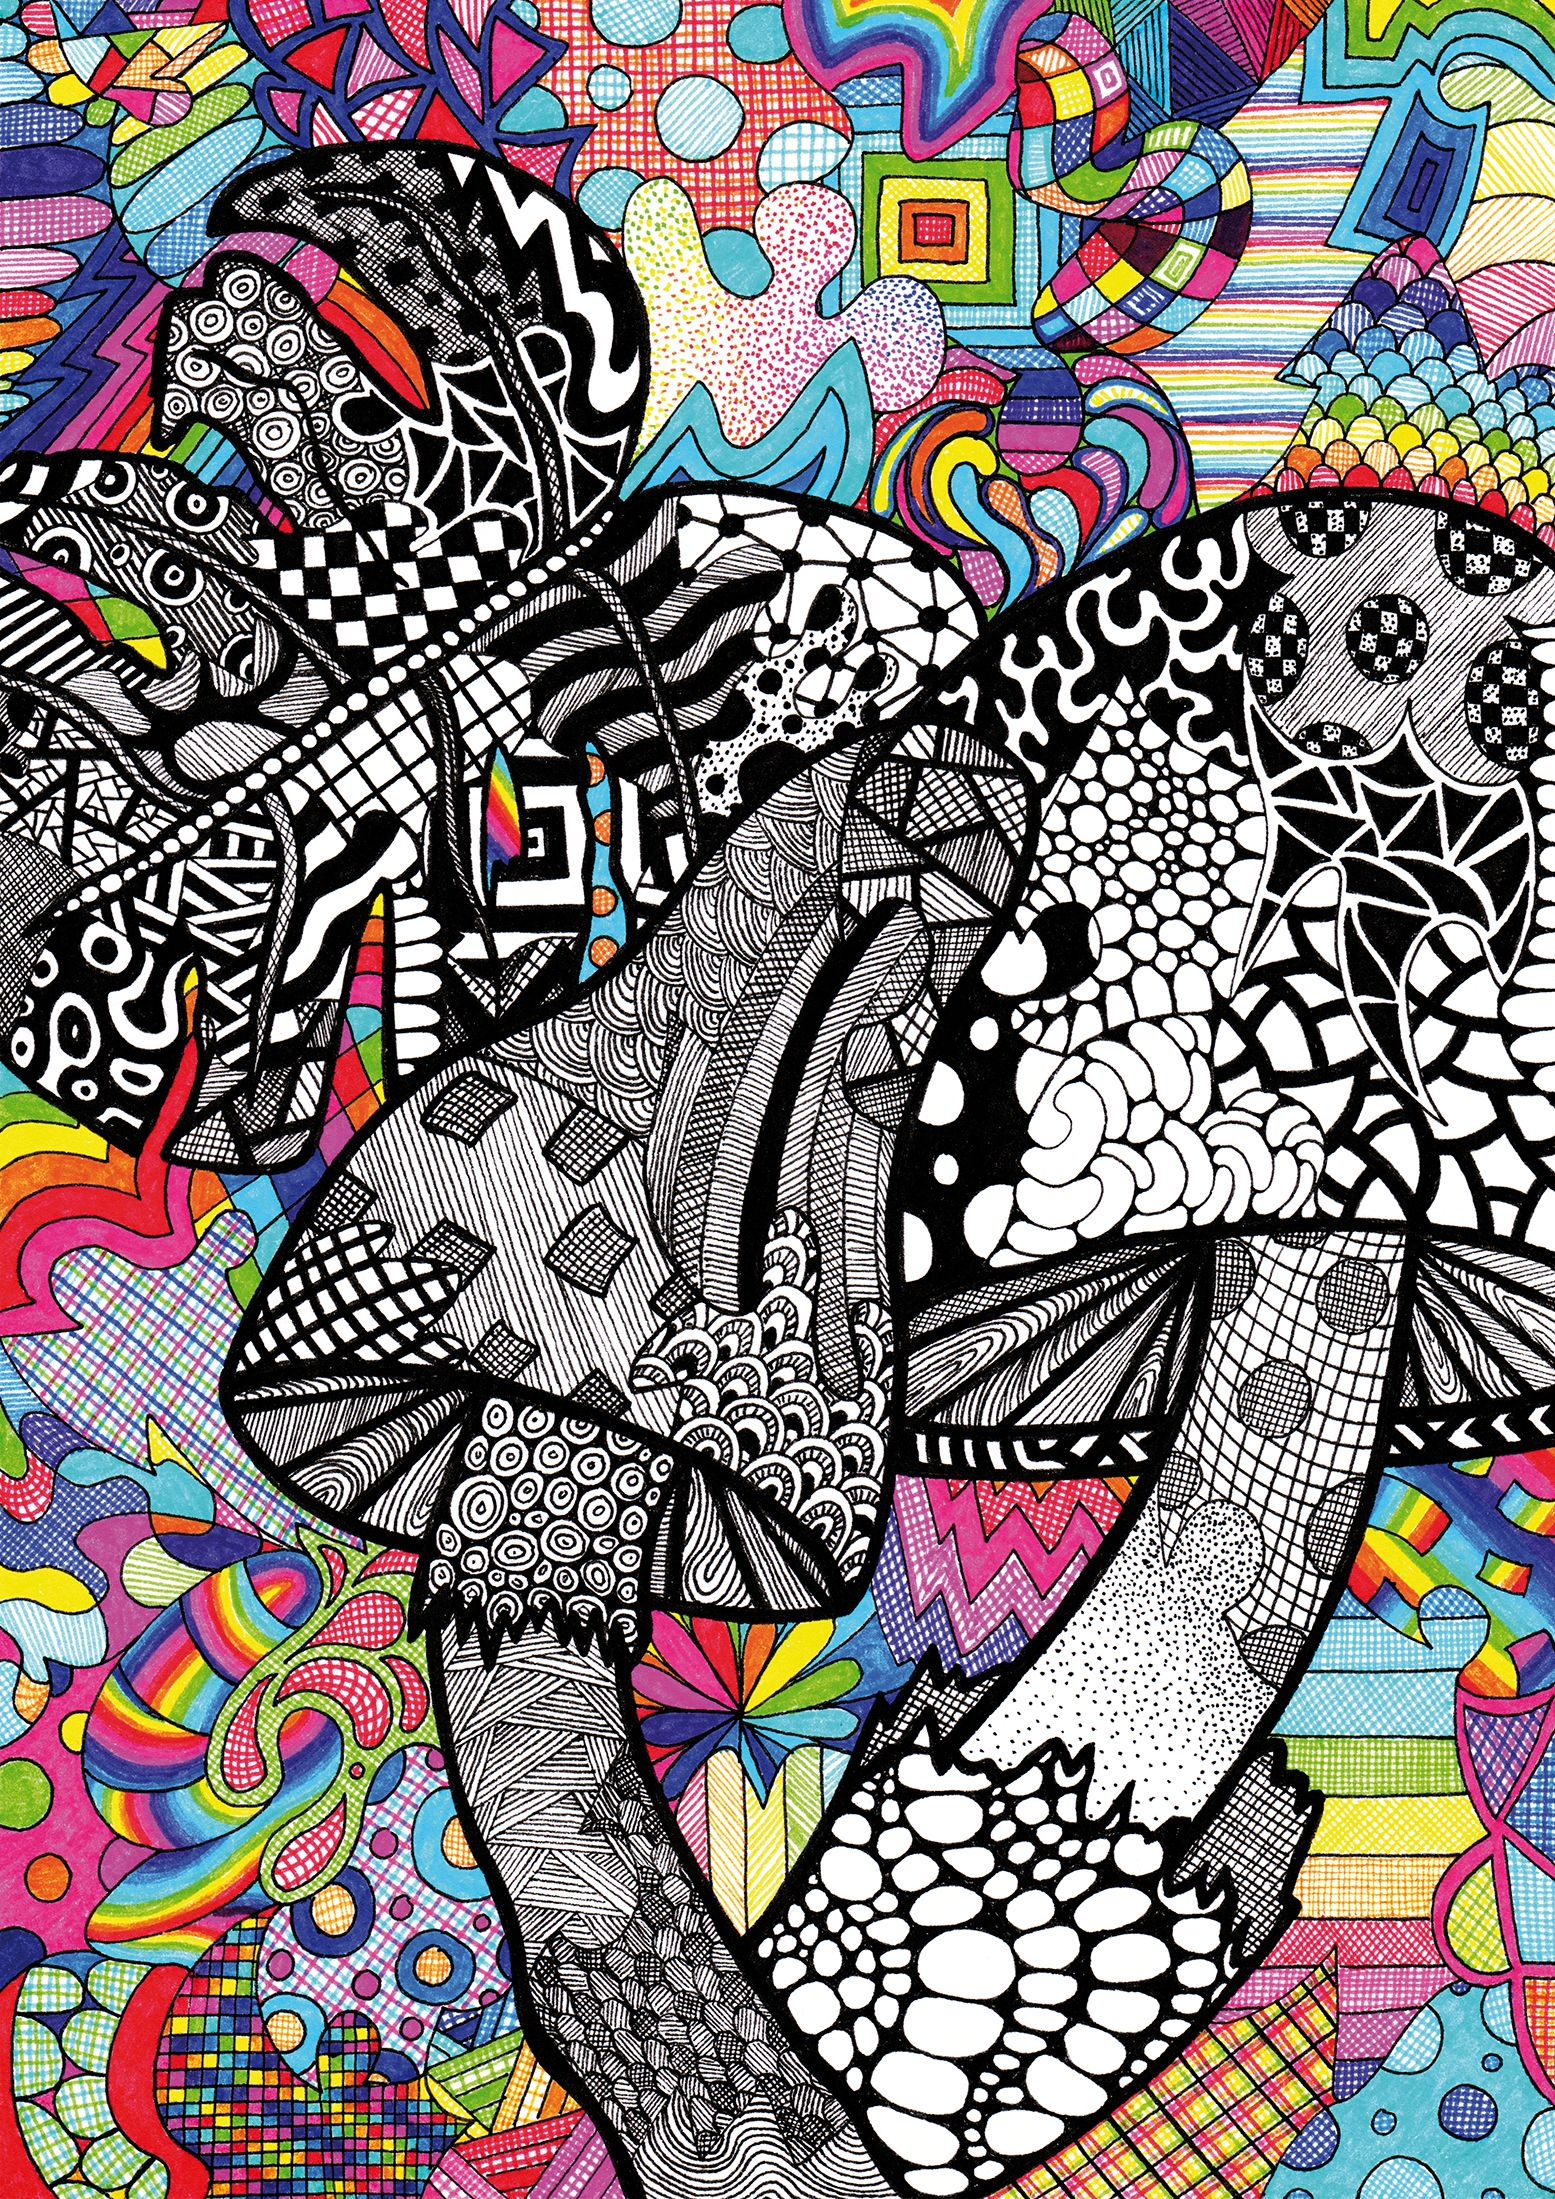 Abstract Mushrooms Drawing Pattern Art Line Drawing A4 Art Printing Colorful Modern Art Handmade Art Print Let S Get Fungi Tonight Mushroom Drawing Pattern Art Line Art Drawings